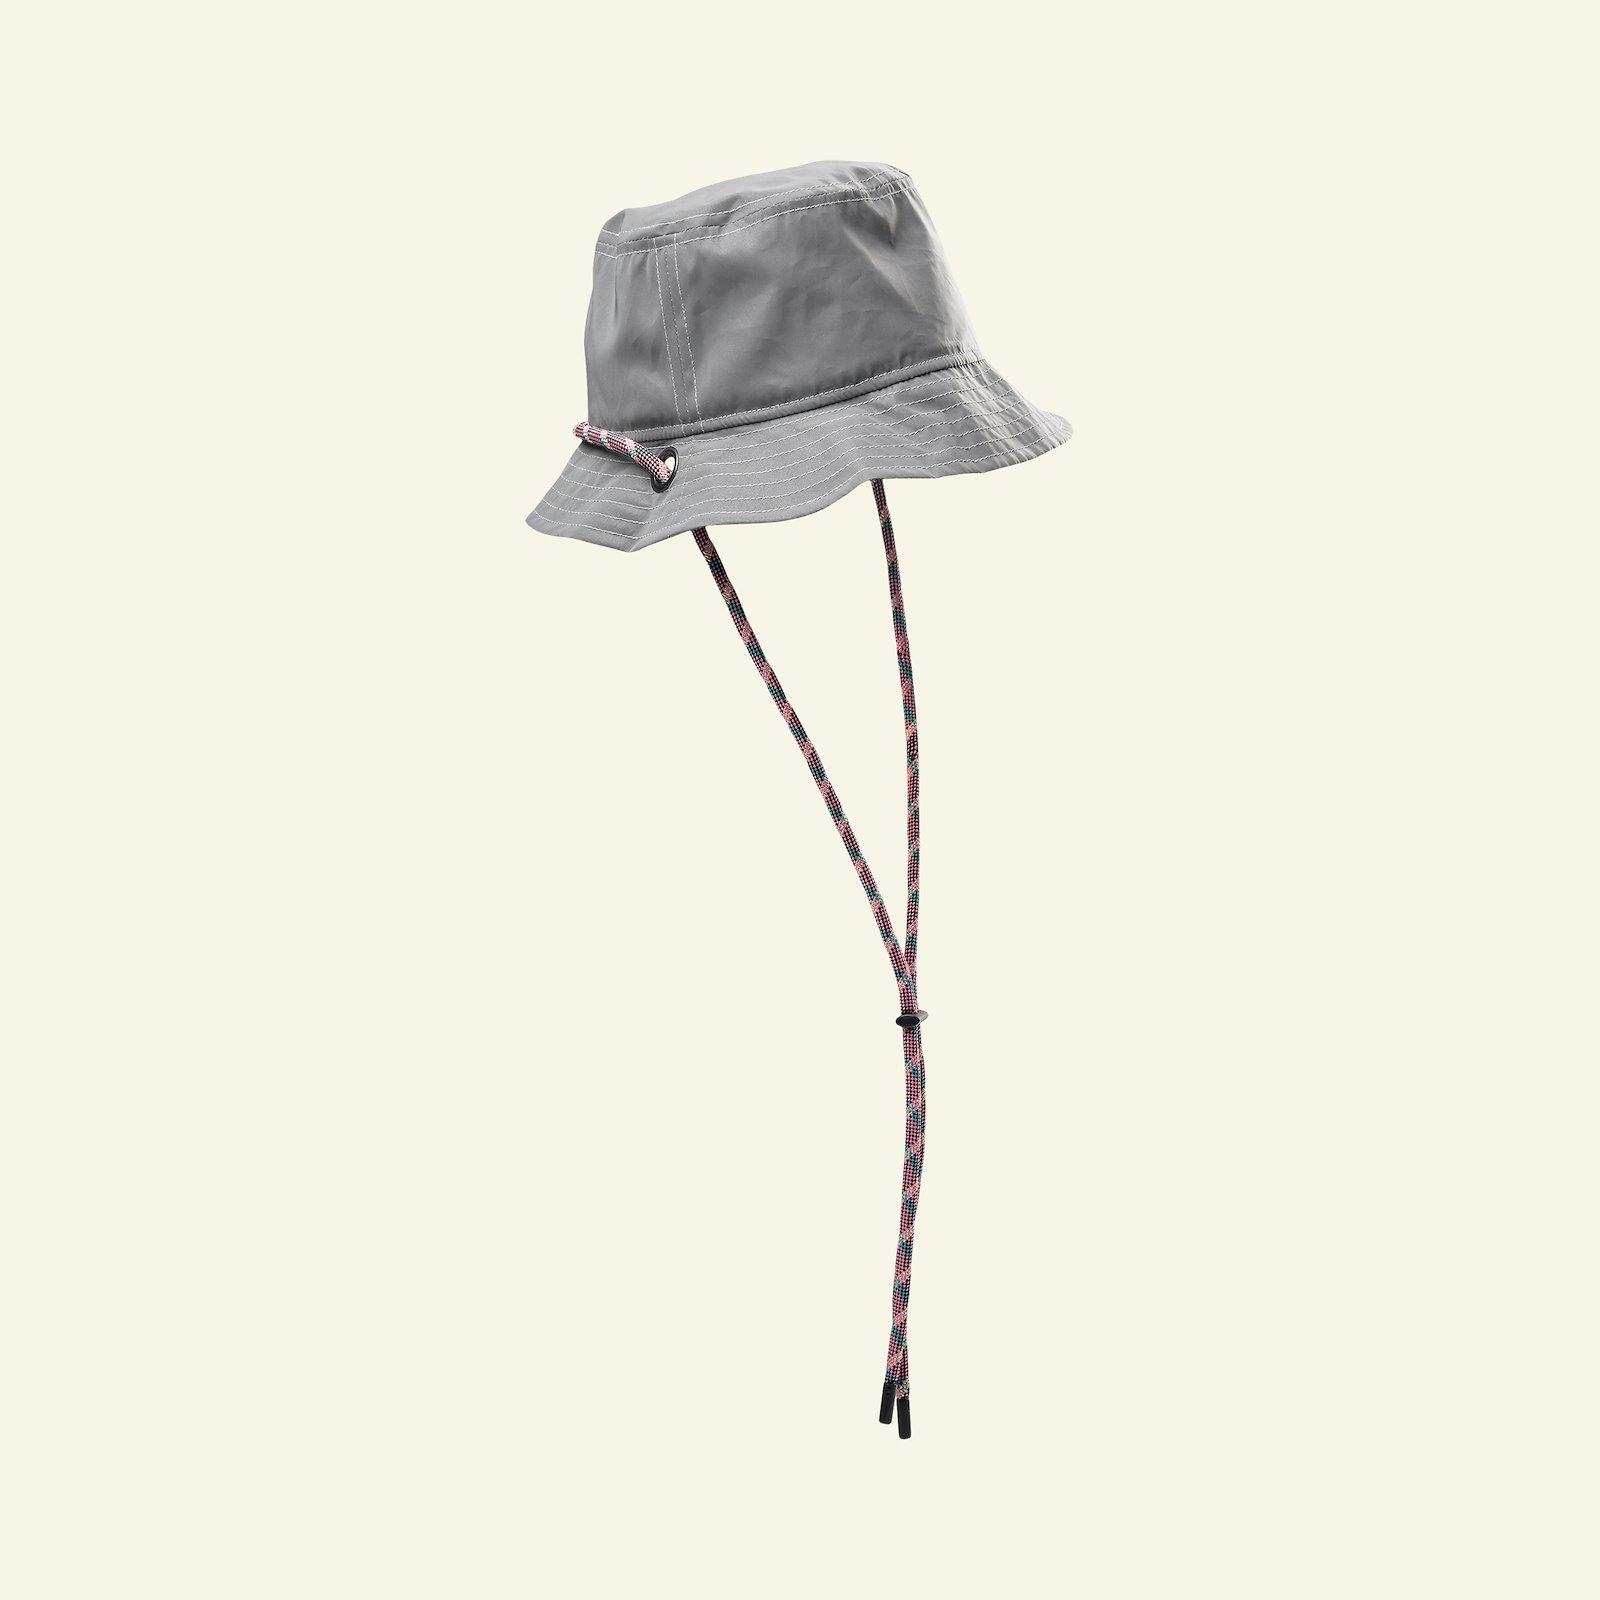 Parachute cord check 8mm rose/petrol 3m p90325_600533_910285_22279_43690_43730_43702_sskit